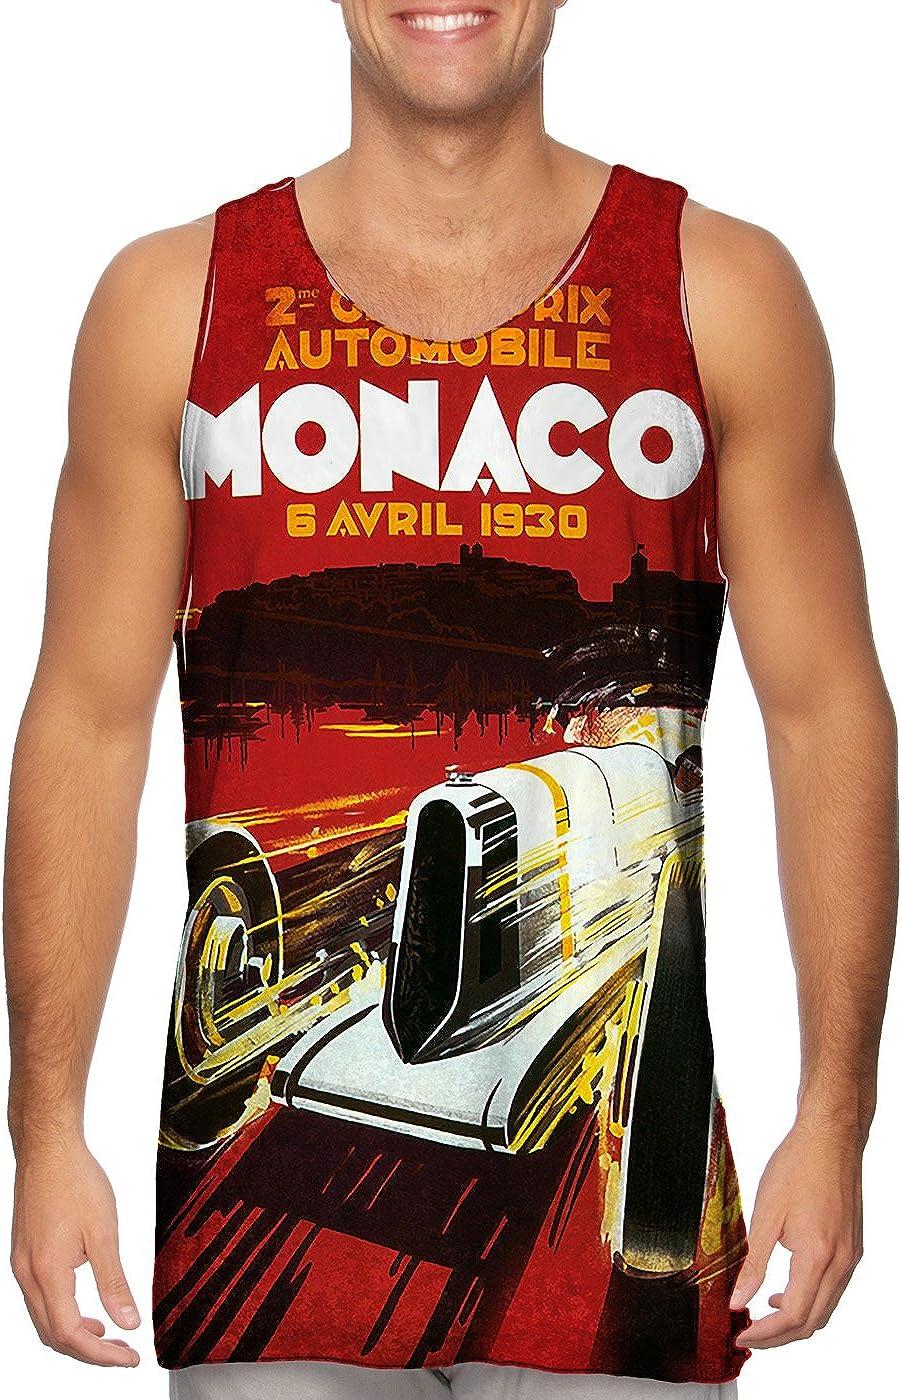 Superior Yizzam- High quality new Monaco Grand Prix Automobile Top -Tshirt- Tank Mens